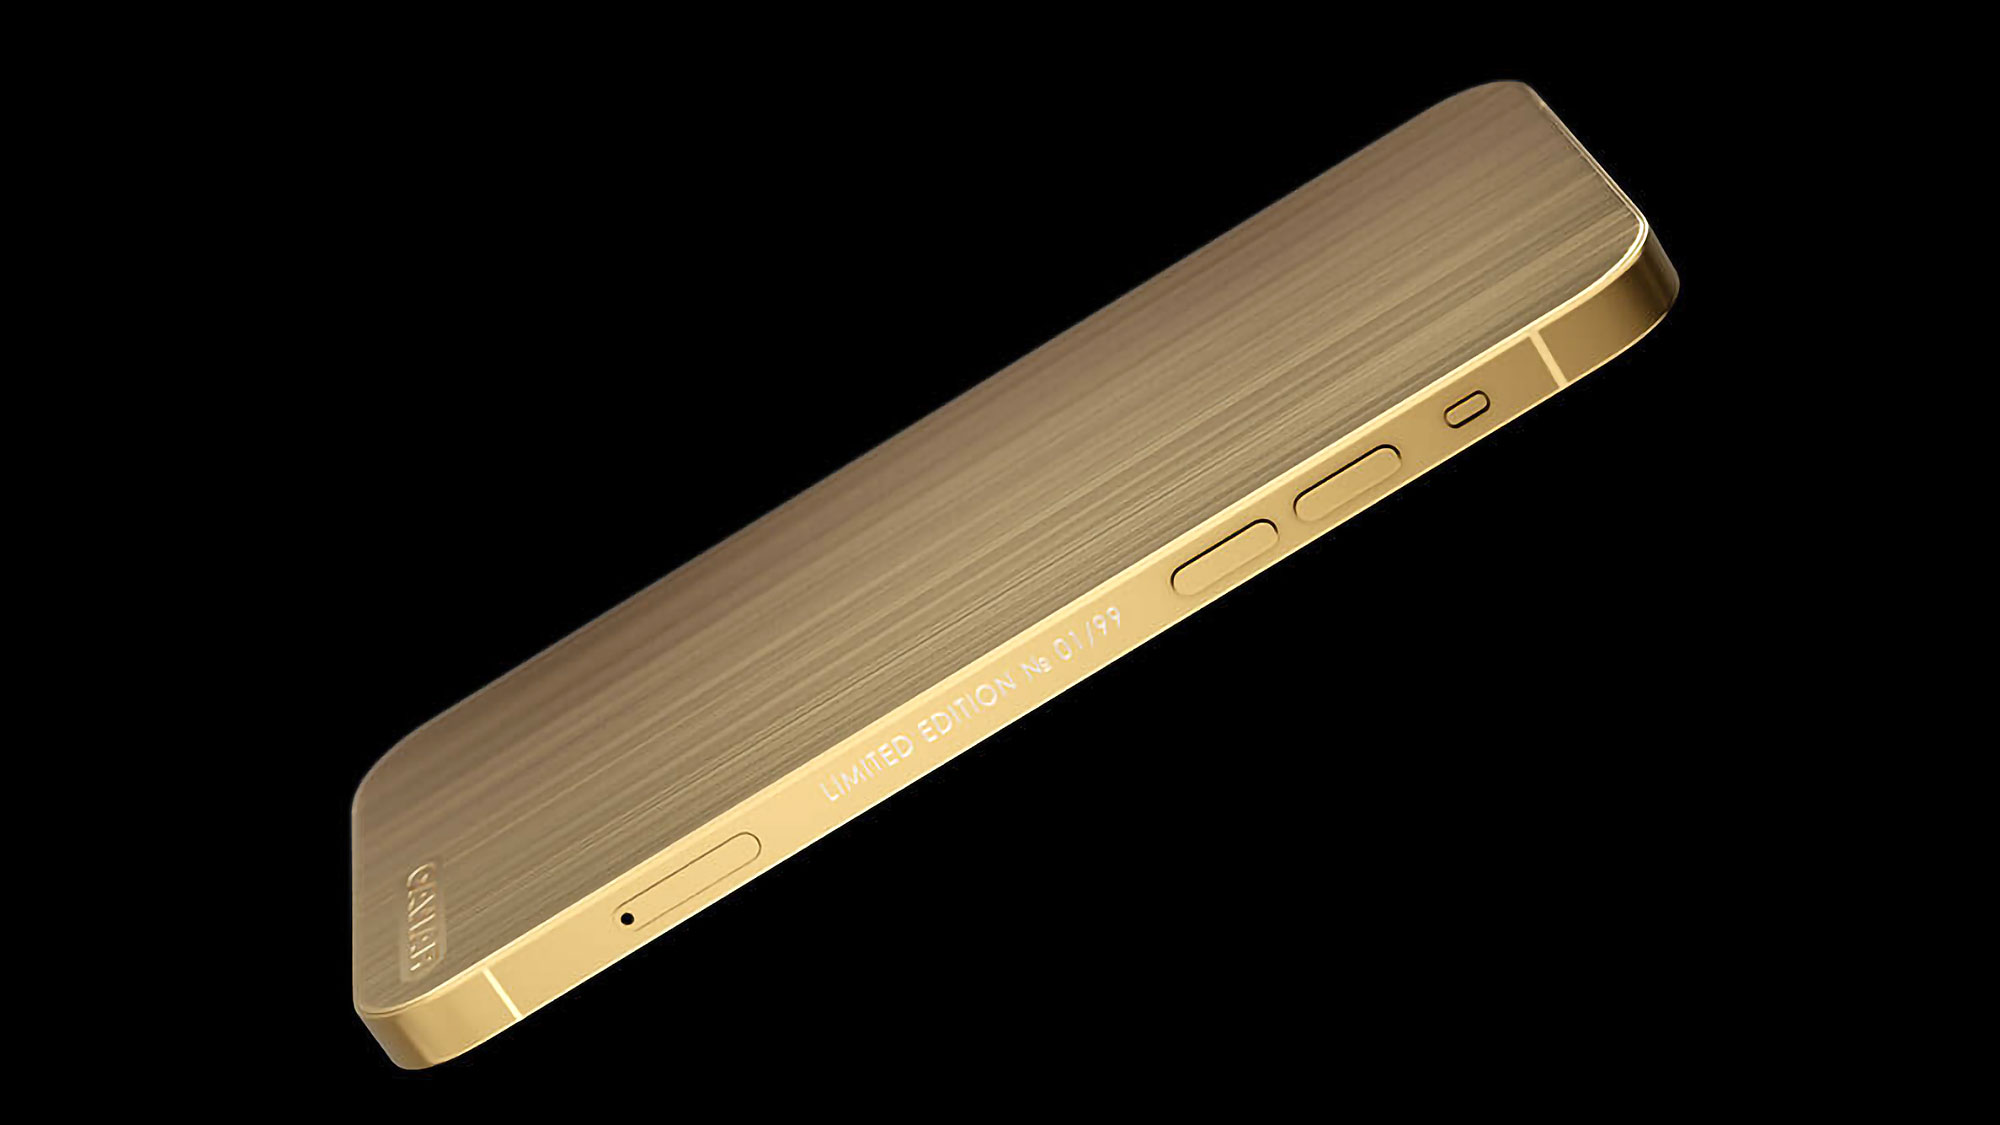 Caviar iPhone 12 Pro Stealth Smartphone